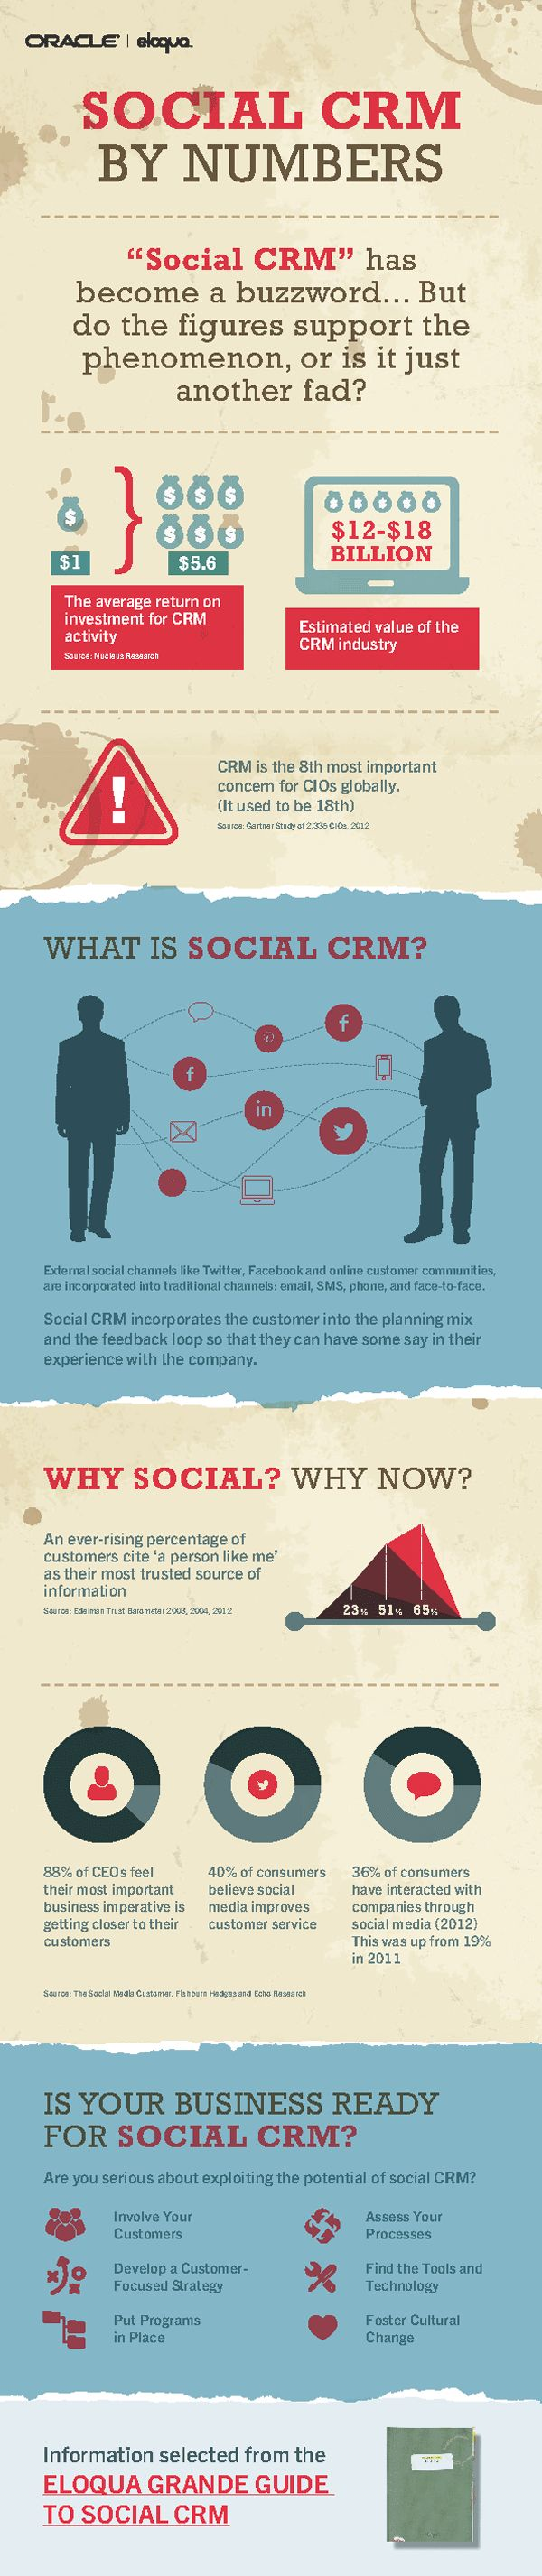 Eloqua-Social-CRM-Infographic1---Version3-DF